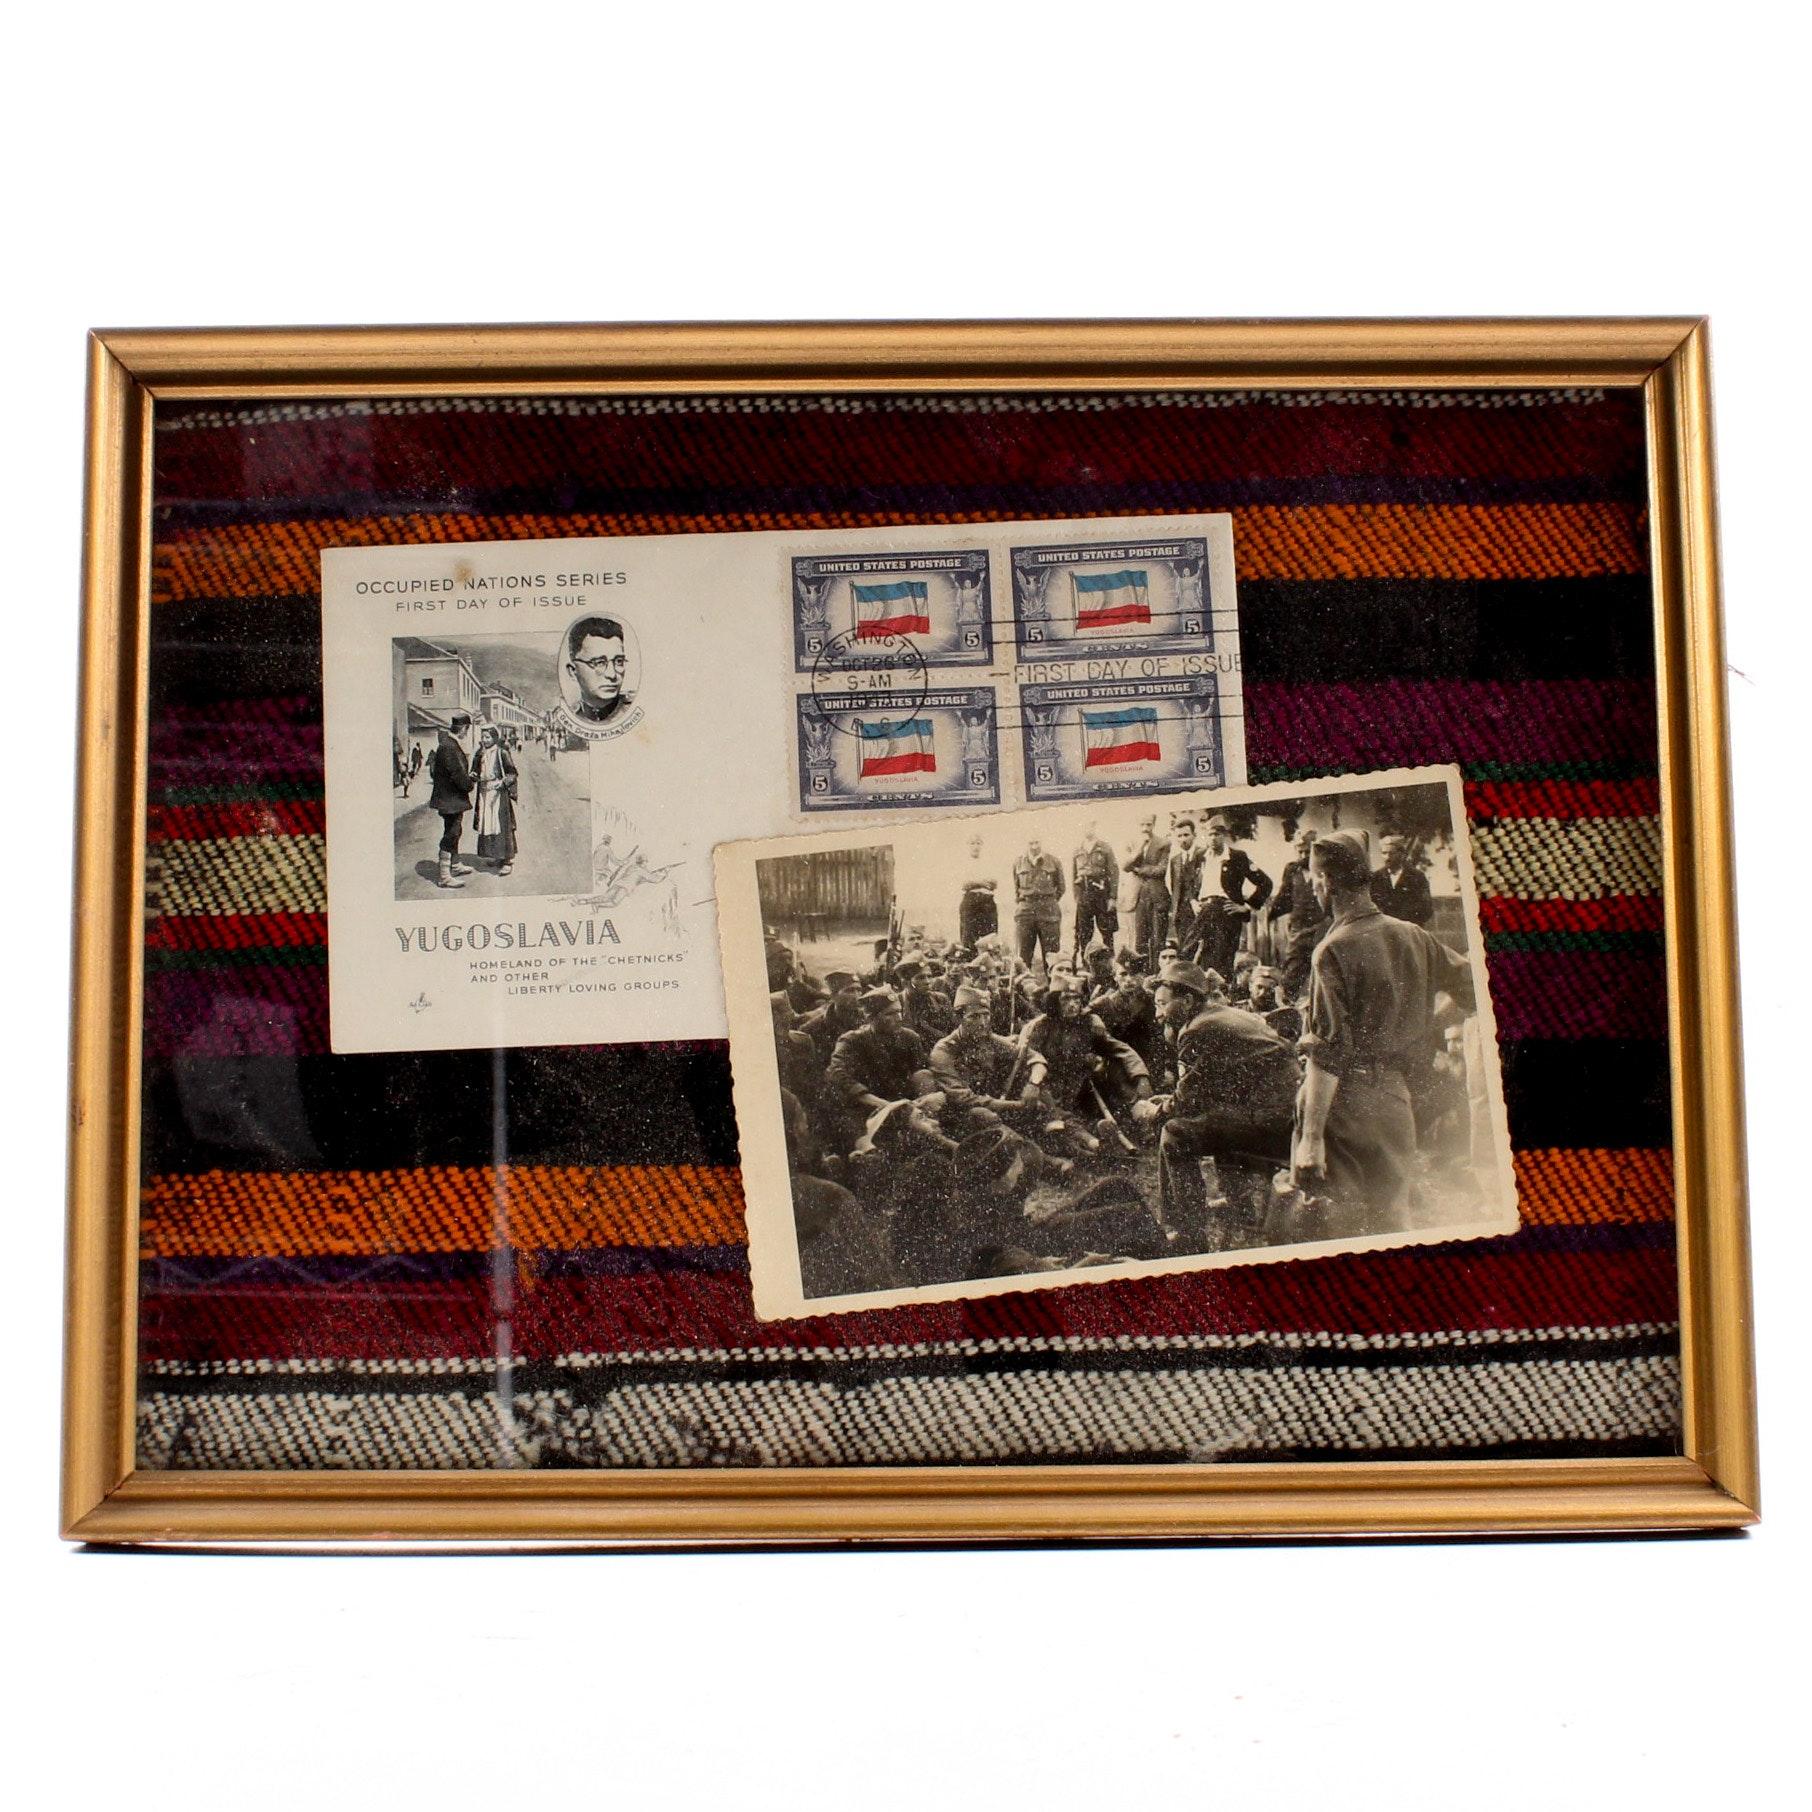 Occupied Yugoslavia Memorabilia